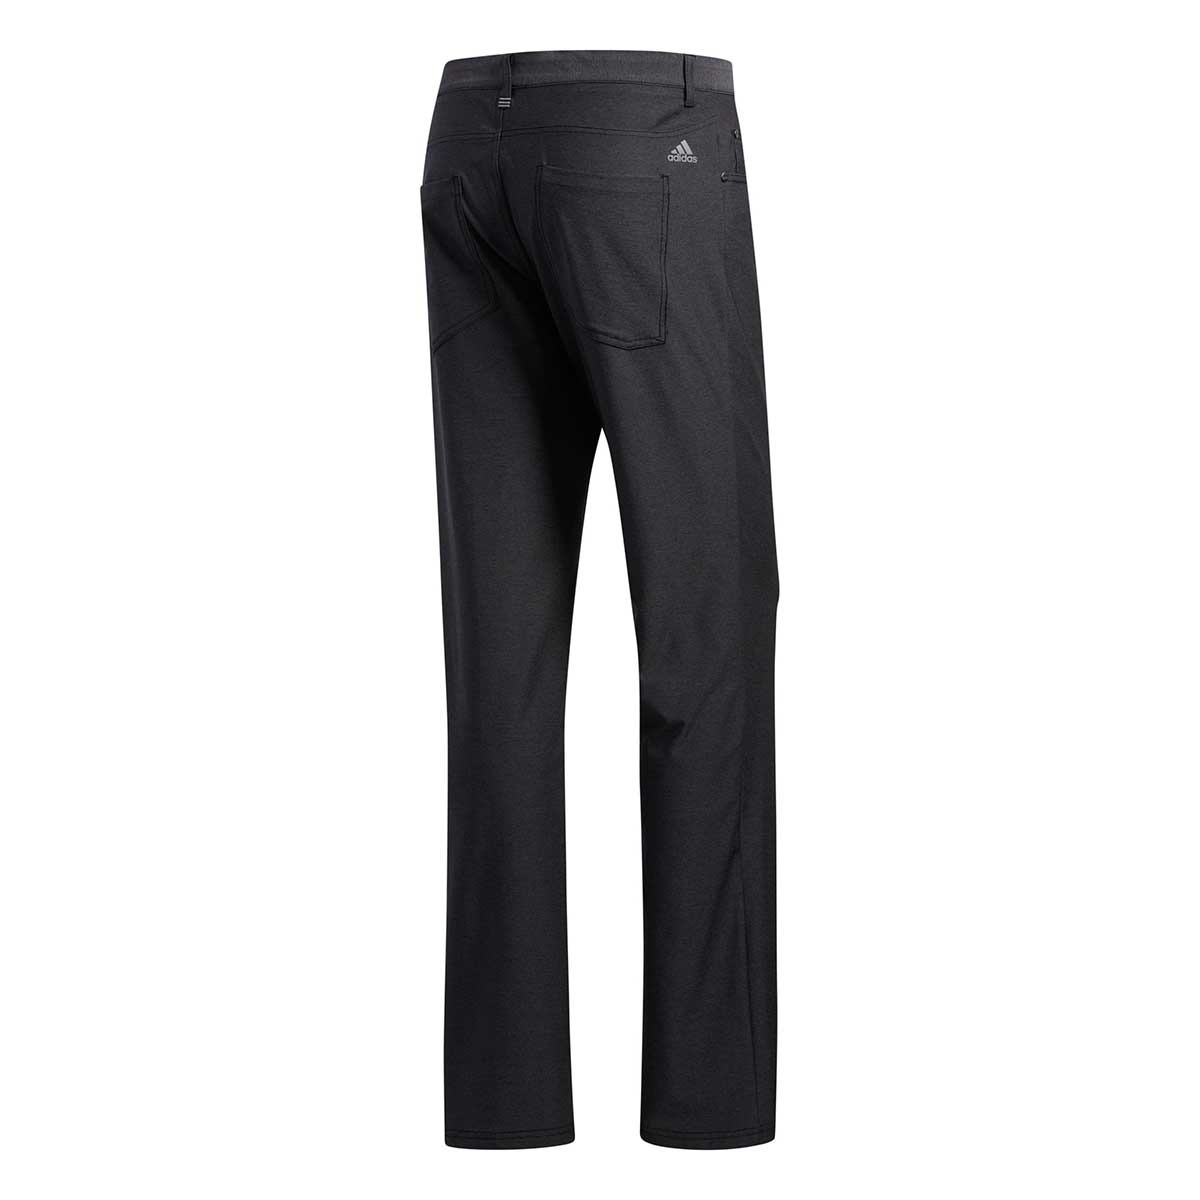 Adidas Men's Ultimate365 Five-Pocket Black Heather Pants